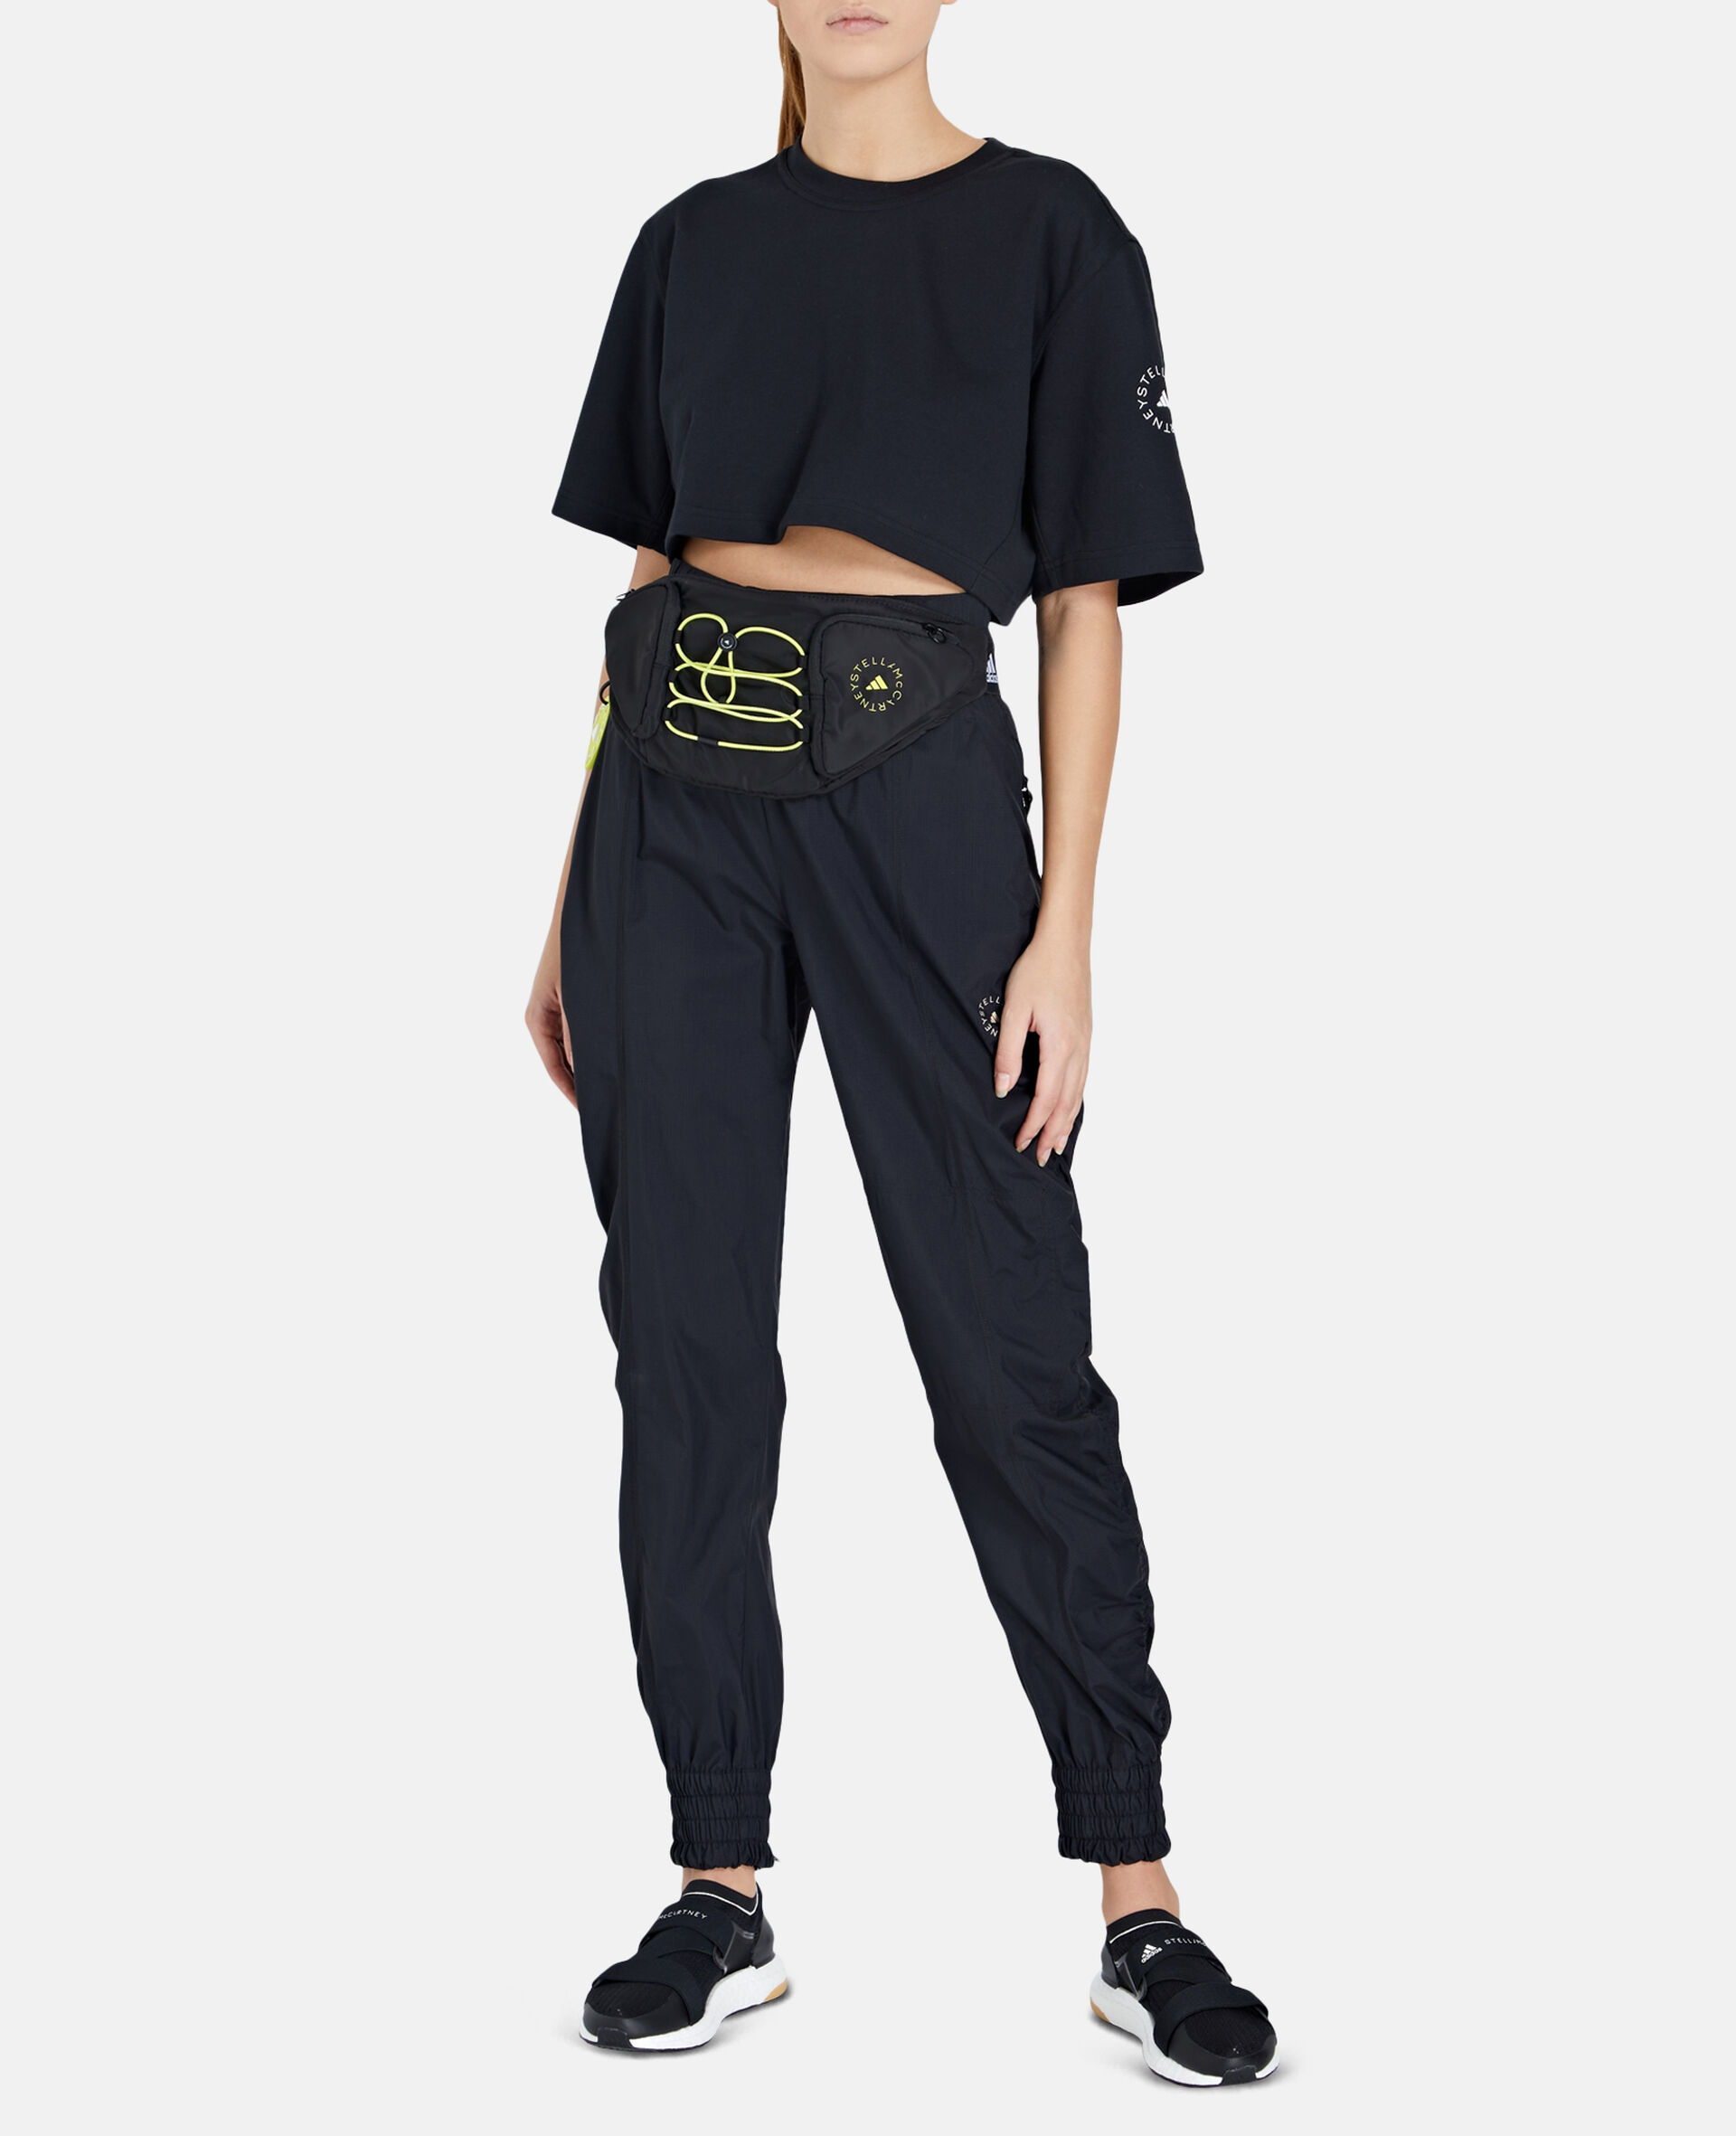 Future Playground Crop T-Shirt-Black-large image number 1